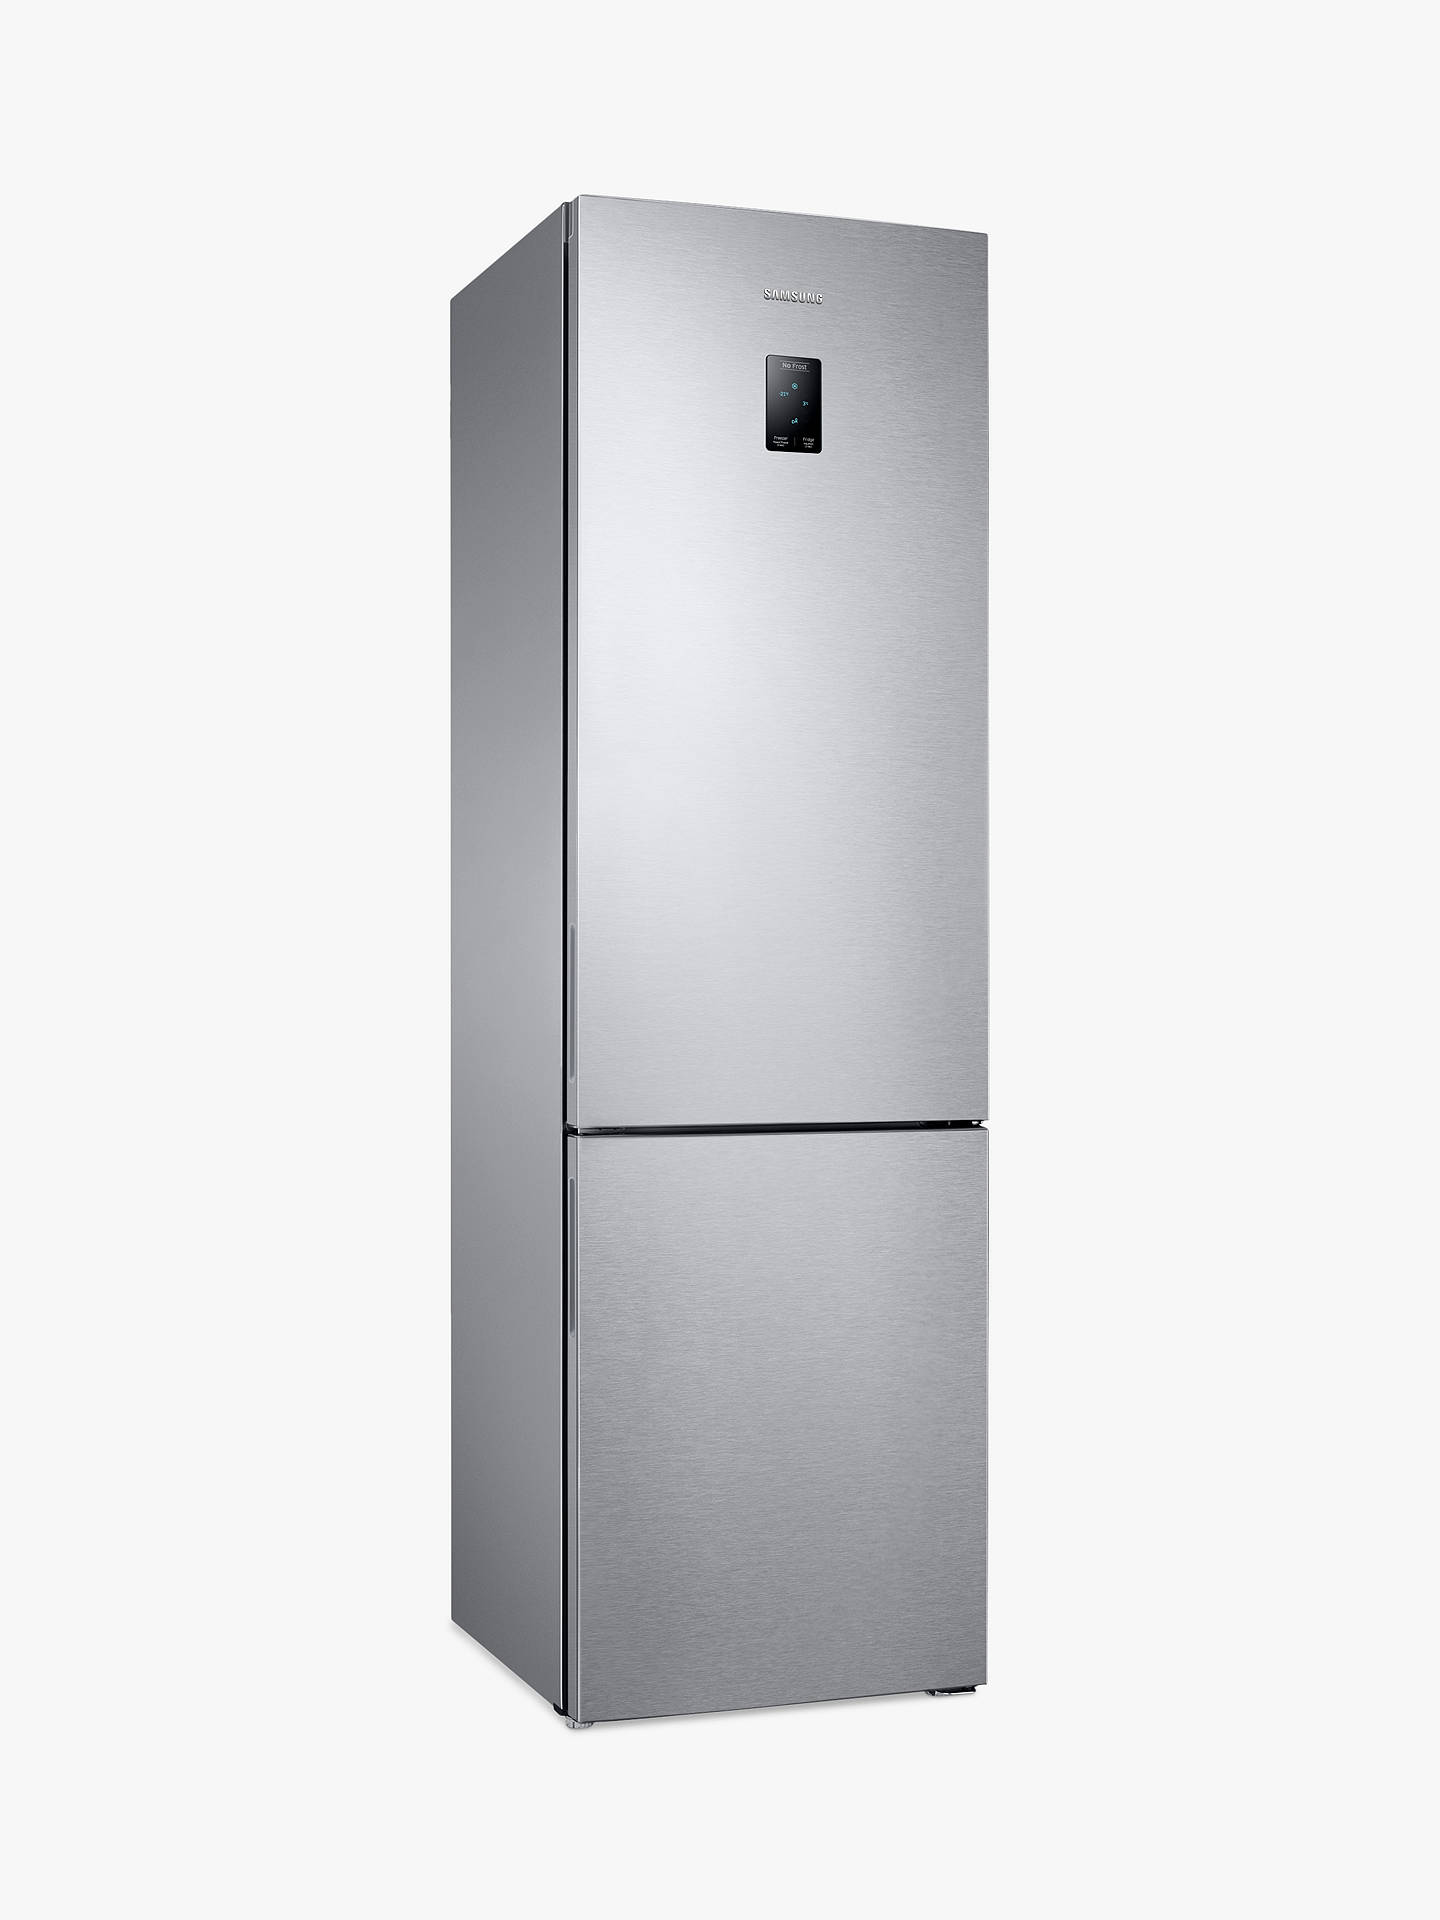 Samsung RB37J5230SL Freestanding Fridge-Freezer, A+ Energy Rating, 60cm  Wide, Stainless Steel